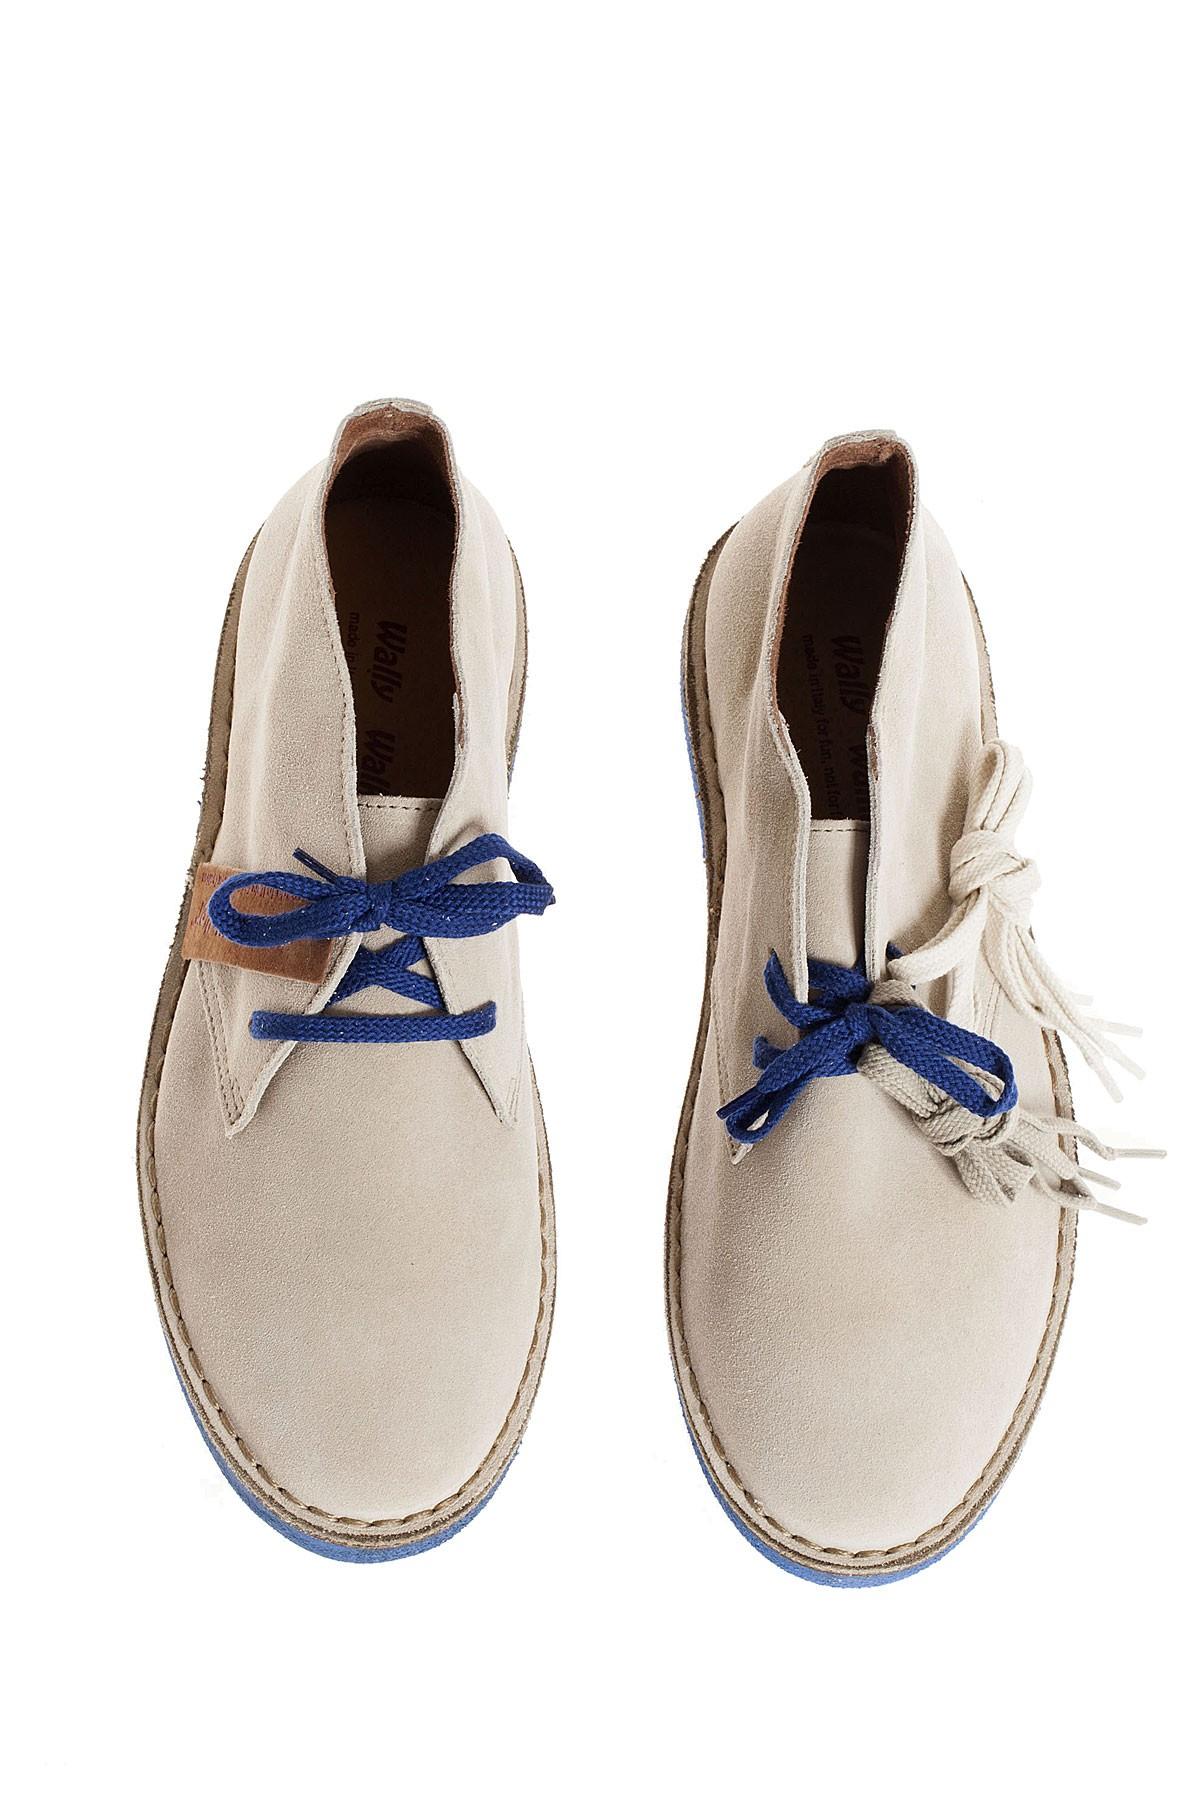 Beige shoes WALLY WALKER CHUKKA for man autumn winter 14-15 - Rione ... 8d78607320d